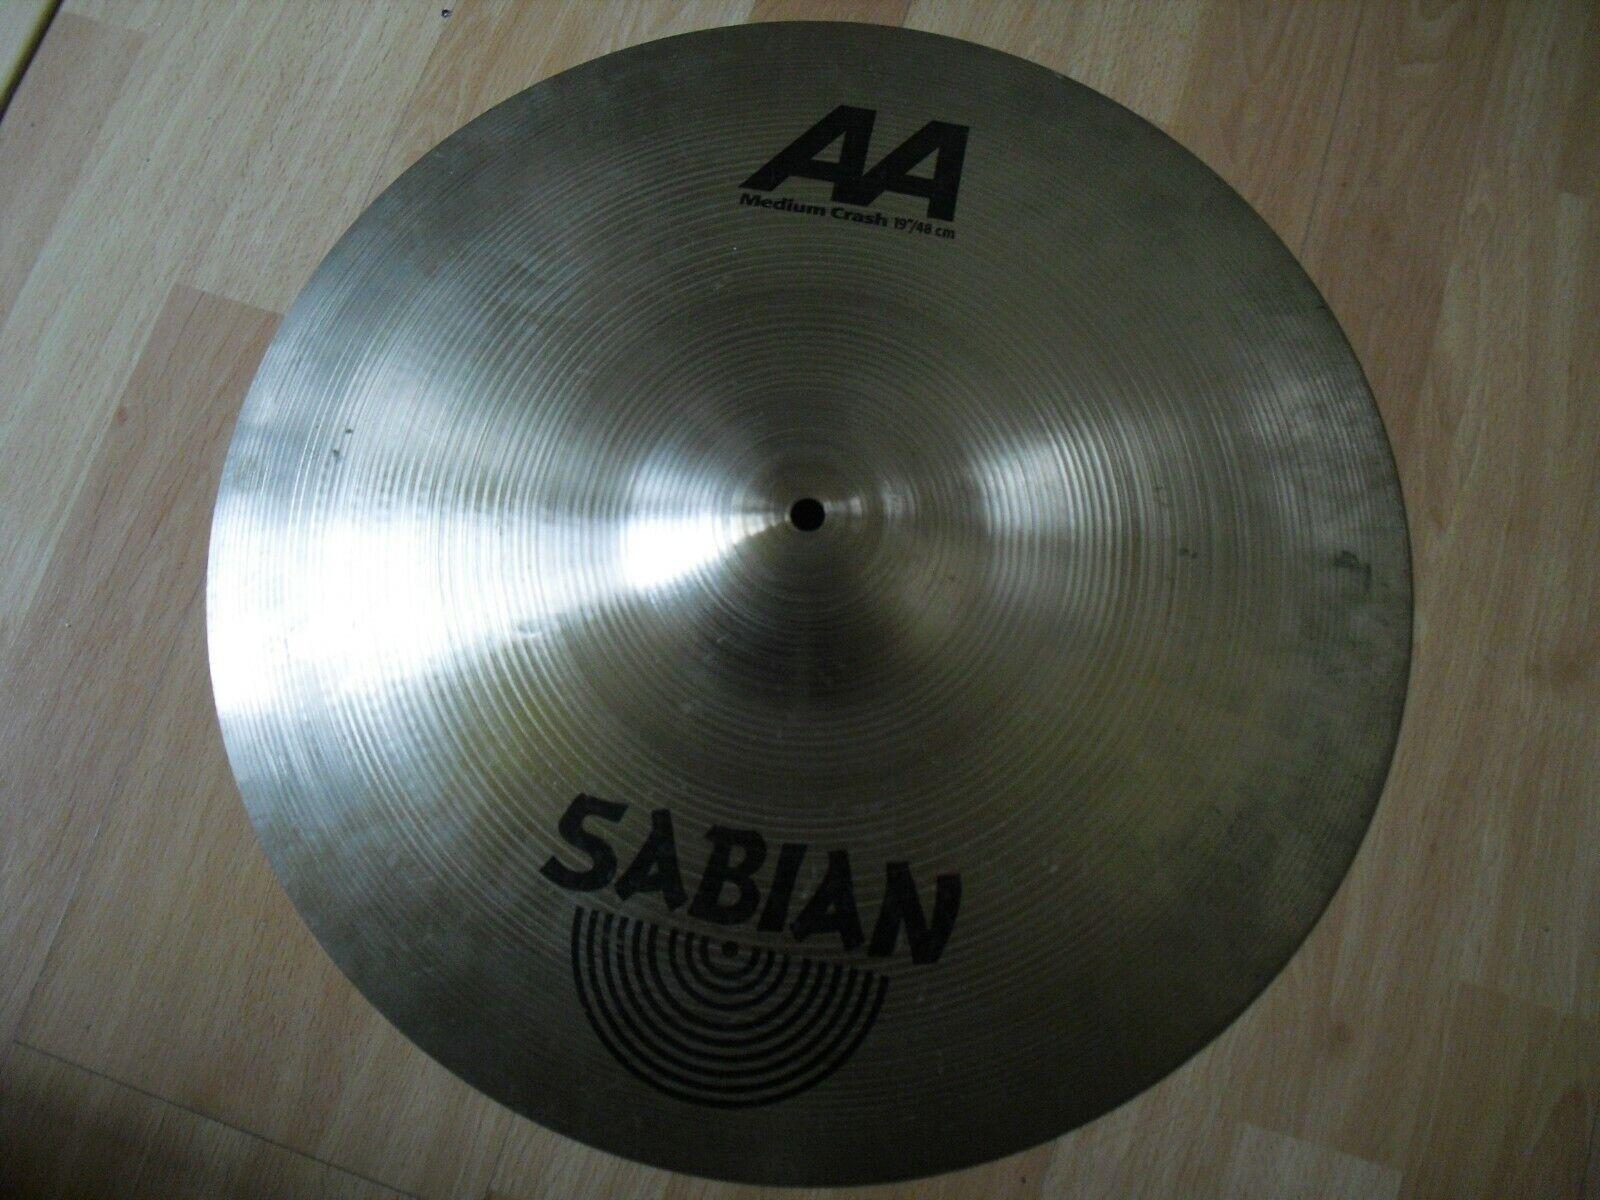 19  Sabian AA Medium Crash Cymbal 1900g traditional finish